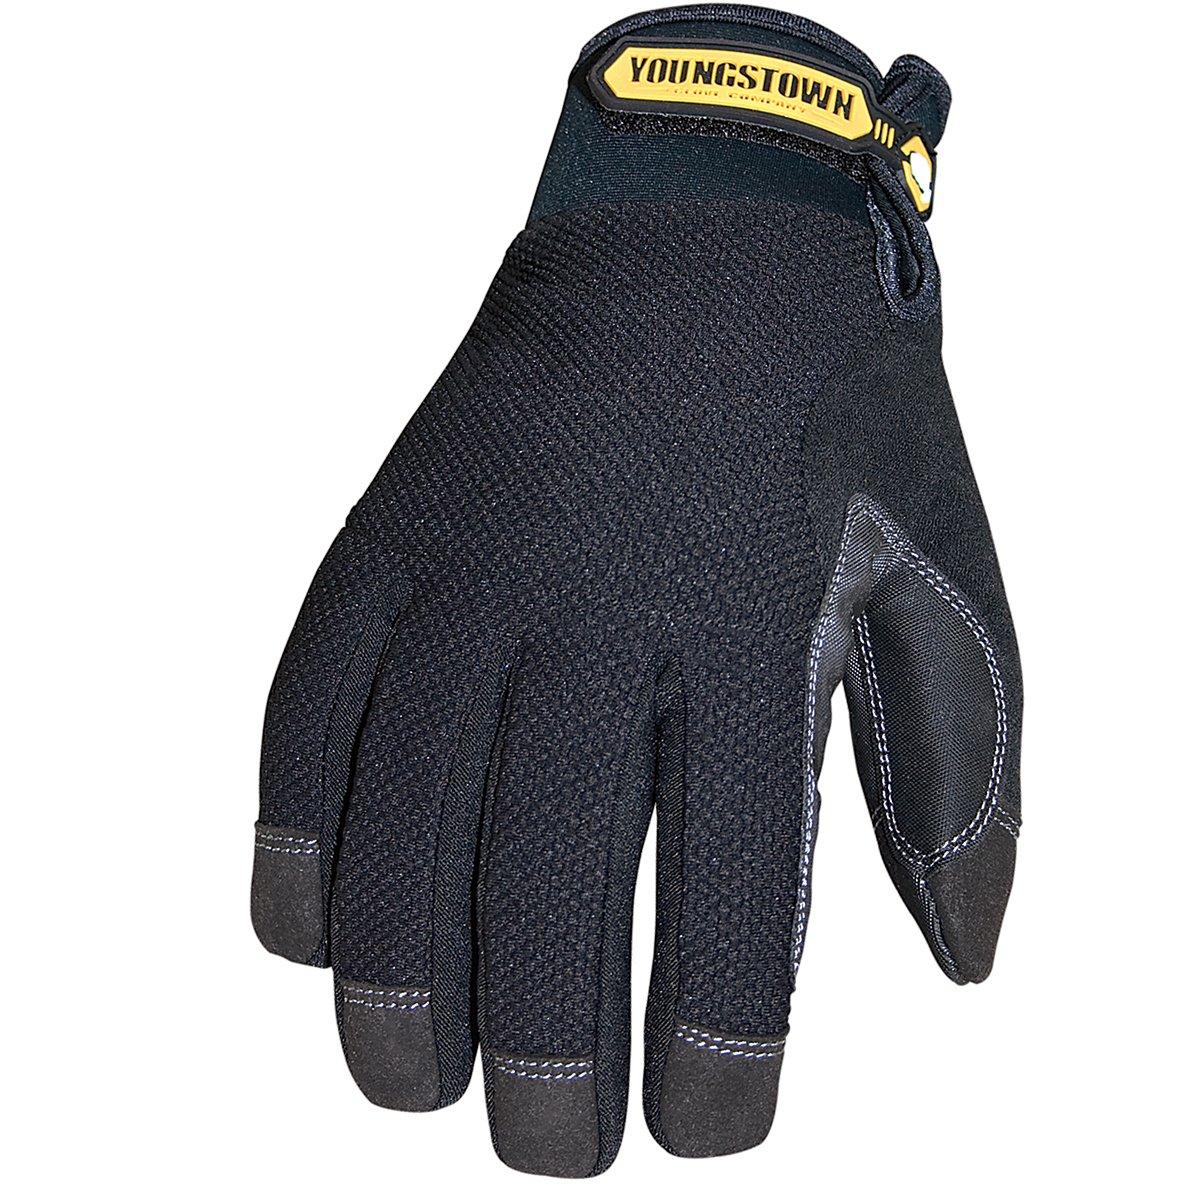 Youngstown Glove 03-3450-80-XXXL Waterproof Winter Plus Gloves, 3X-Large